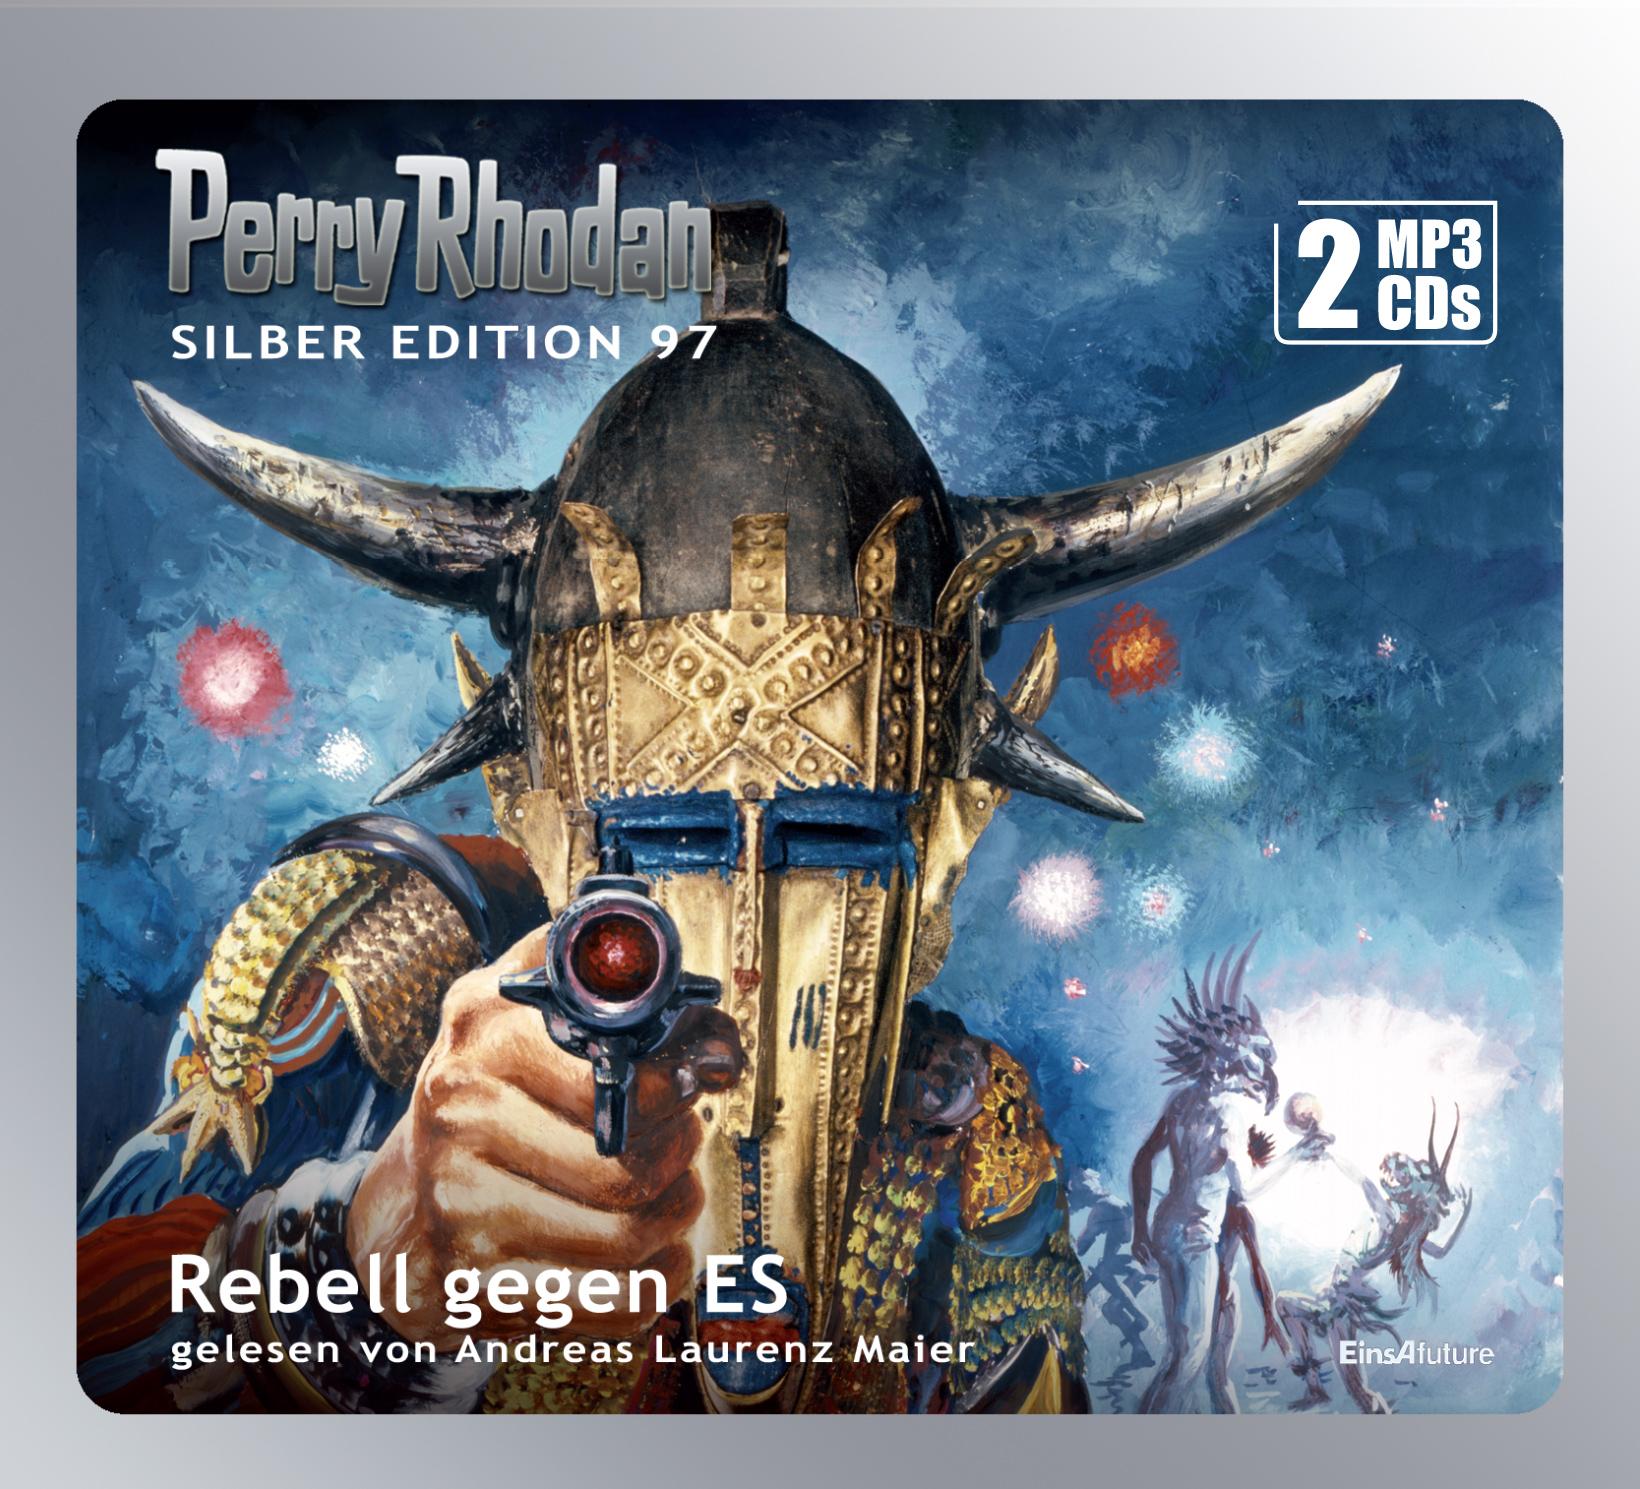 Perry Rhodan Silber Edition 97 William Voltz 9783957950505